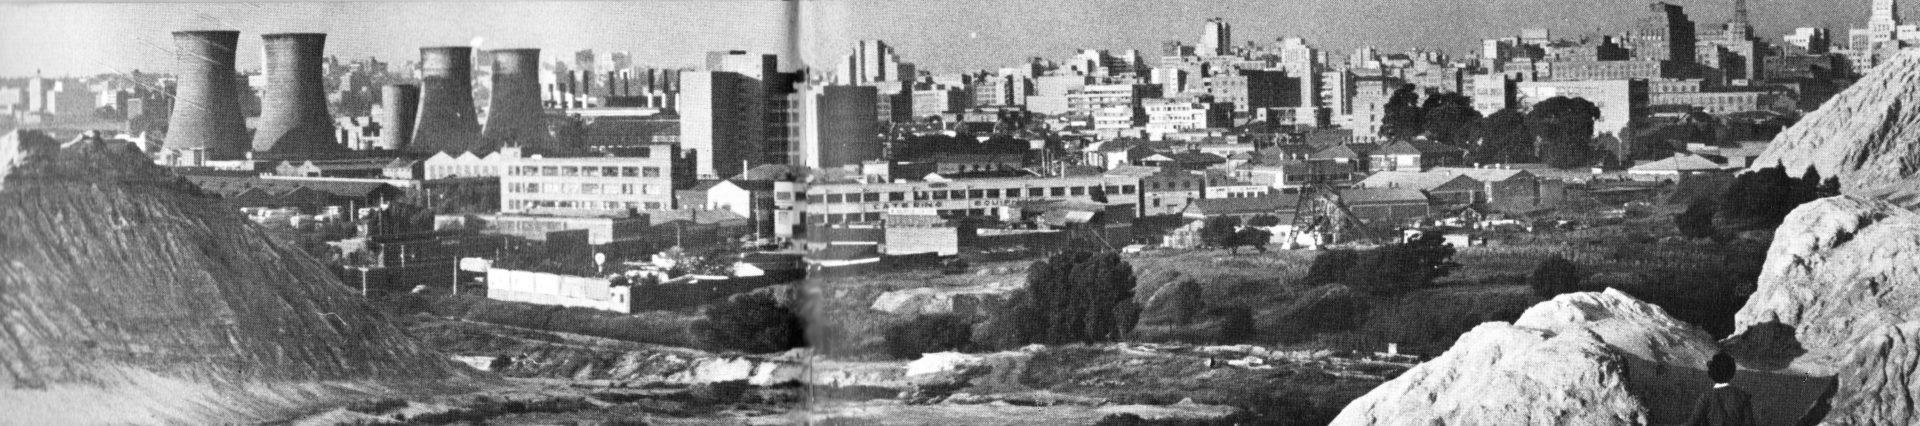 Historical downtown Johannesburg with mine dumps – Ekala tours